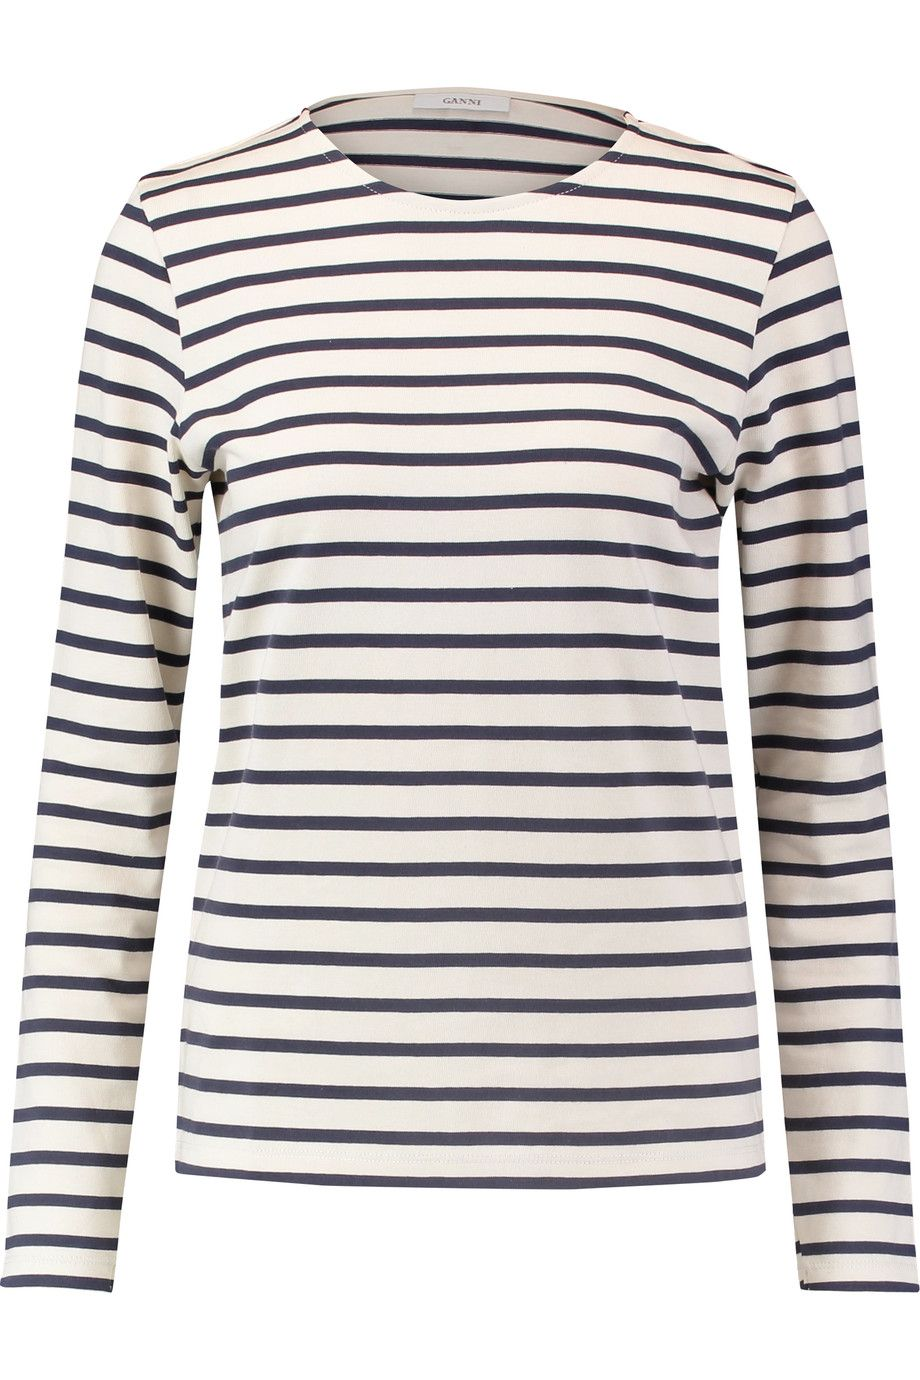 219a998cfa GANNI Striped Cotton Top. #ganni #cloth #top   Ganni   Tops, House ...